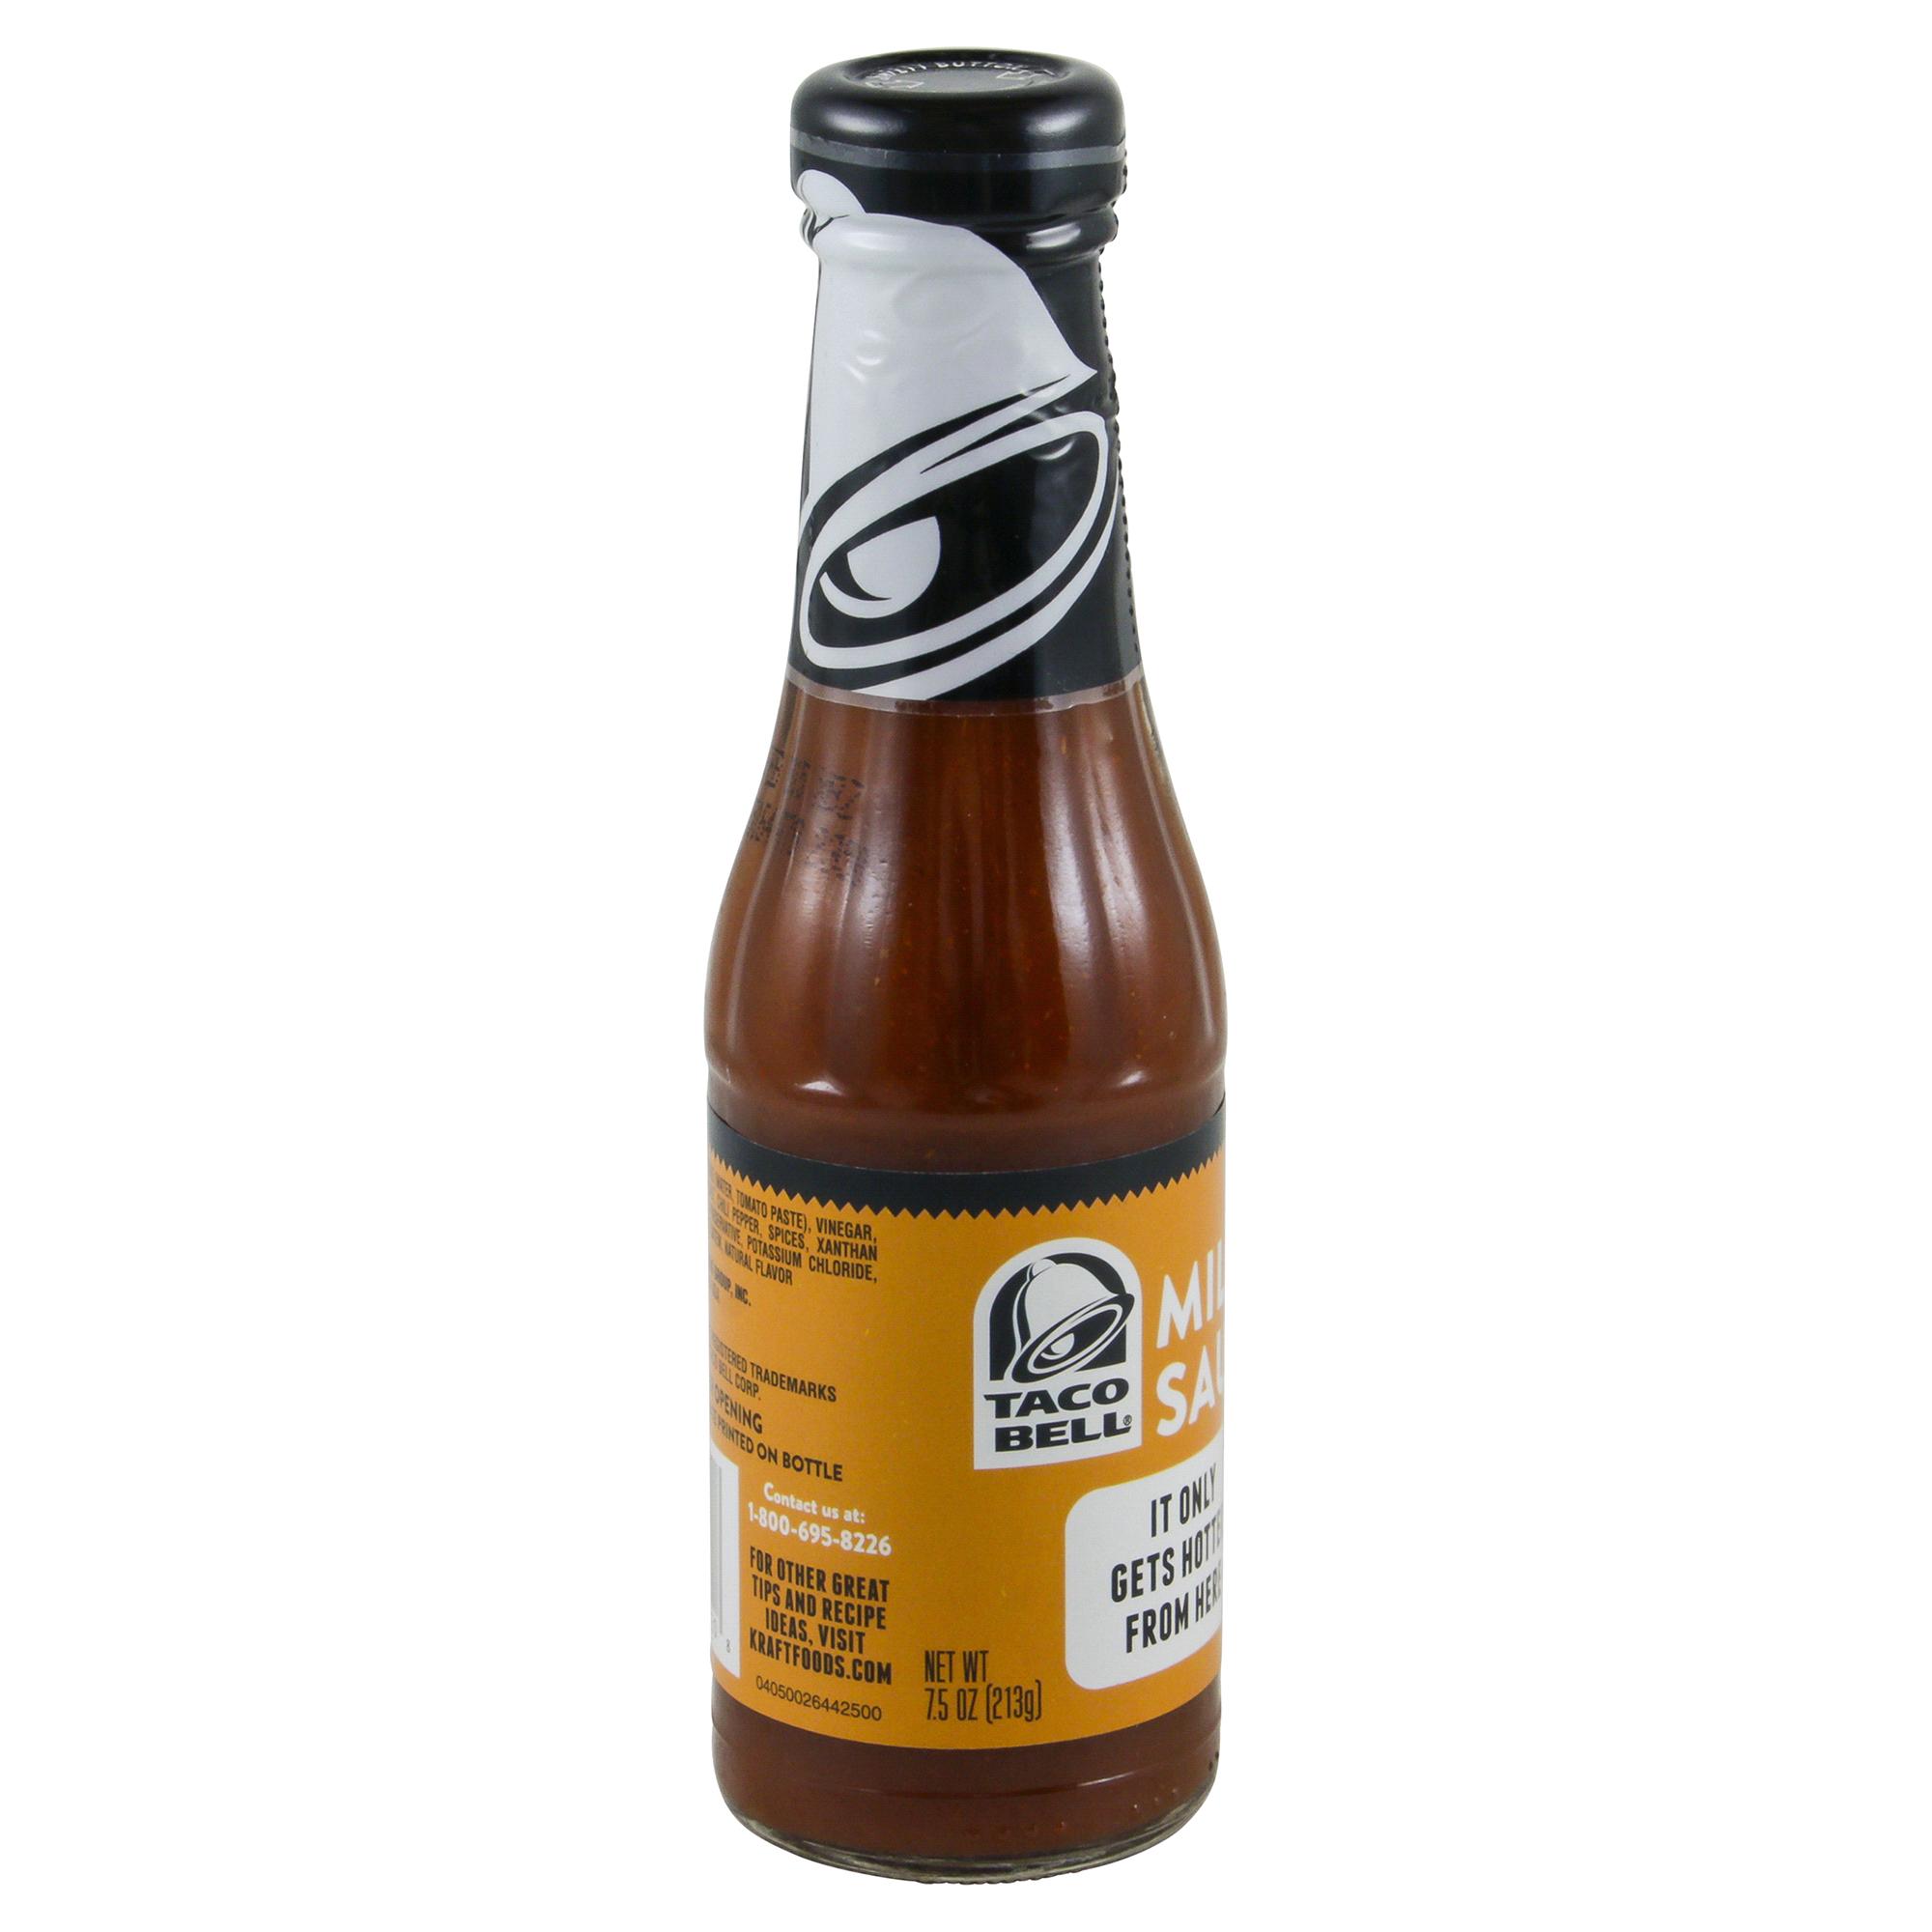 Taco Bell Mild Sauce 7.5 oz Bottle | Meijer.com